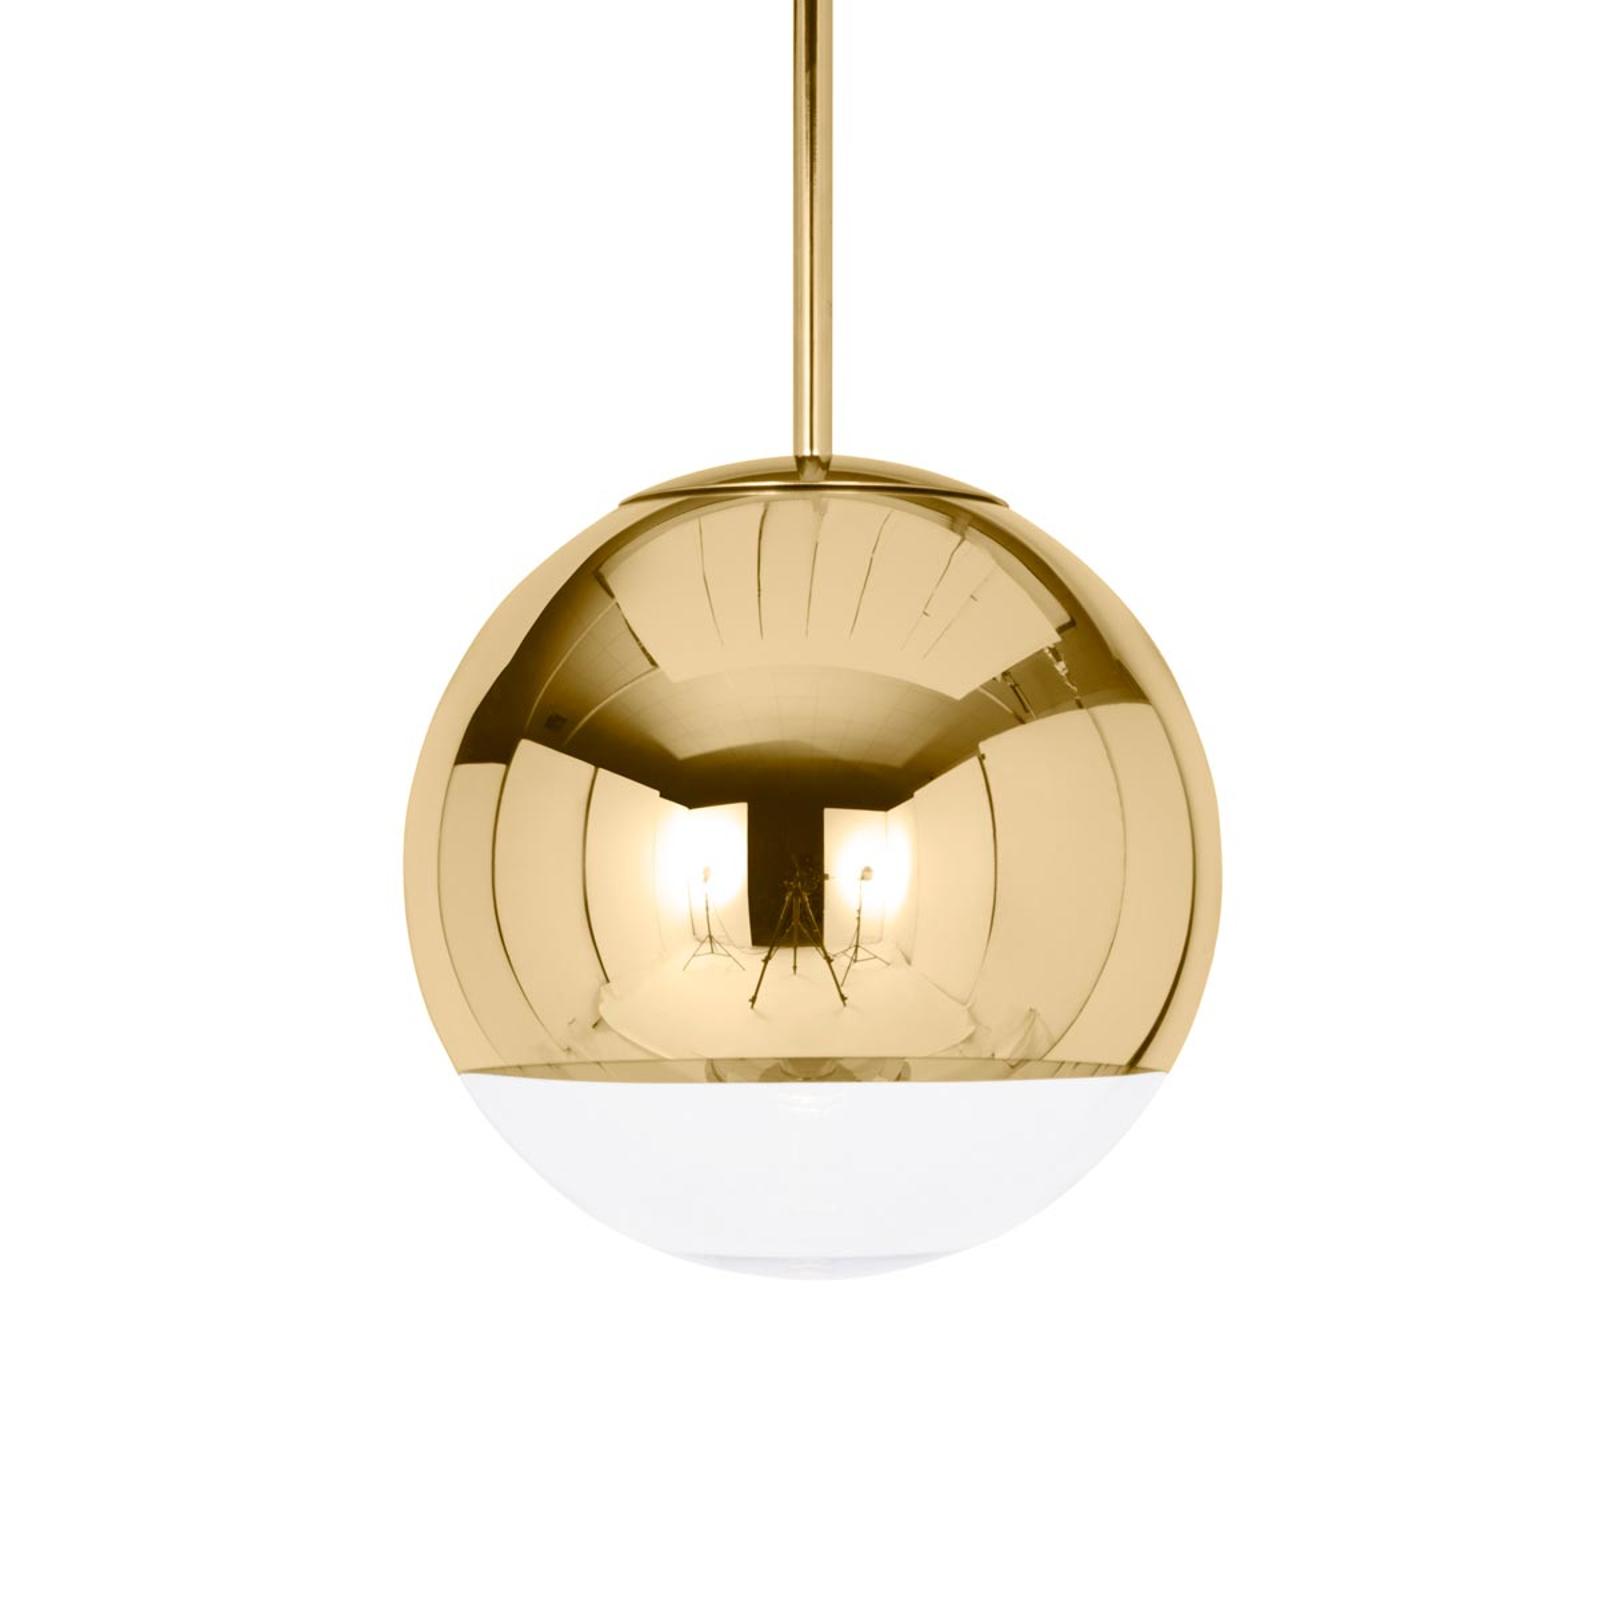 Blank gyllen pendellampe Mirror Ball 25 cm